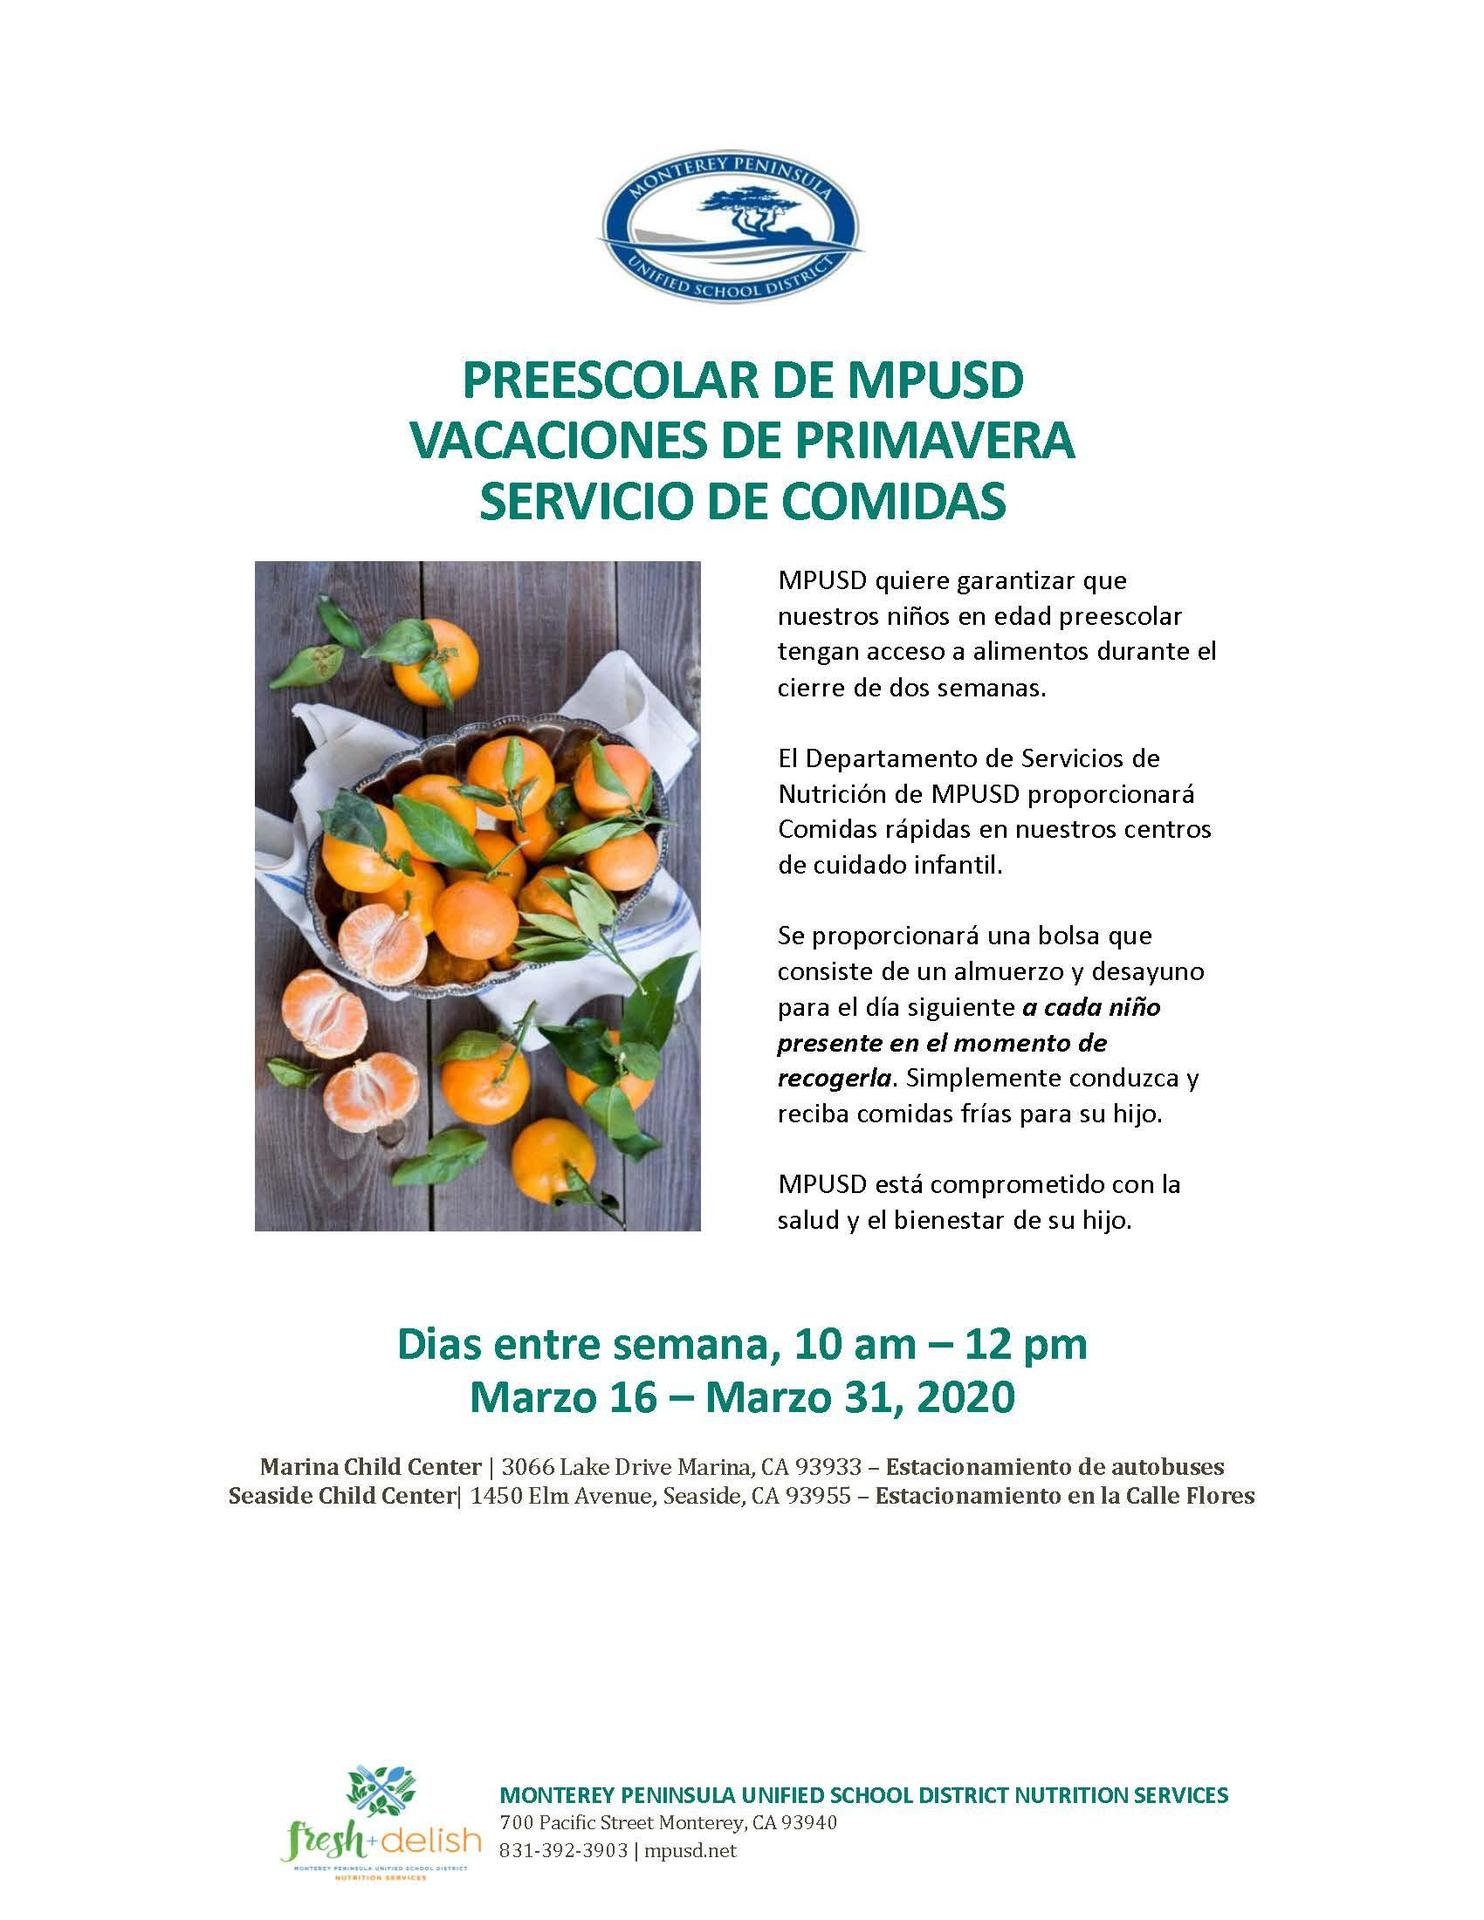 Spanish Preschool Food Service Flyer